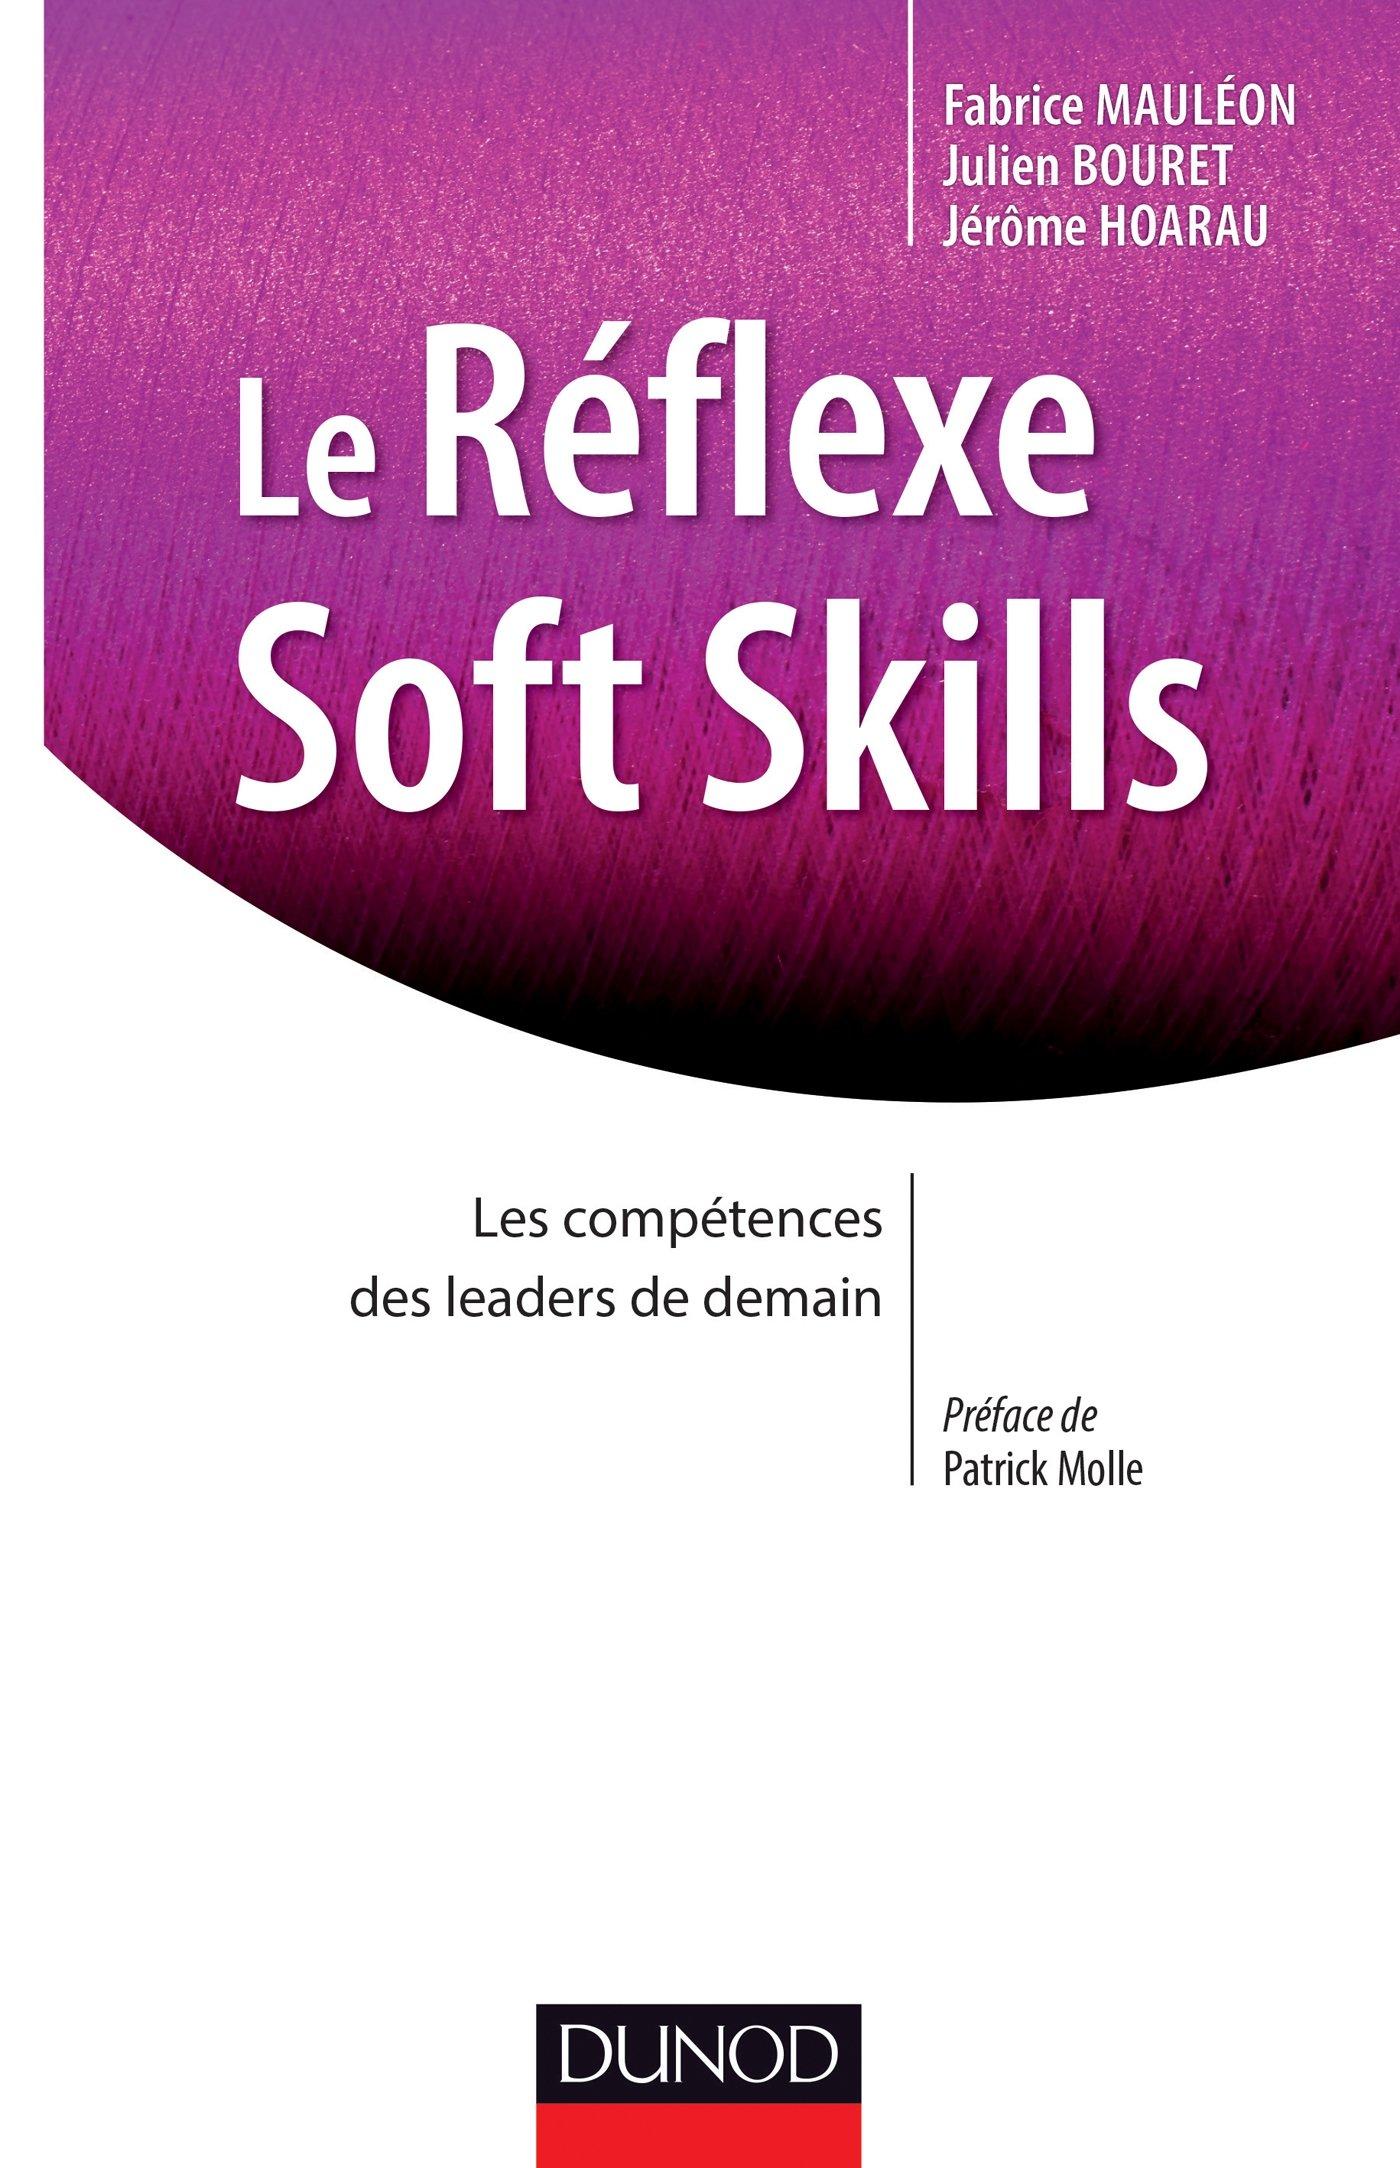 couv re flexe soft skills